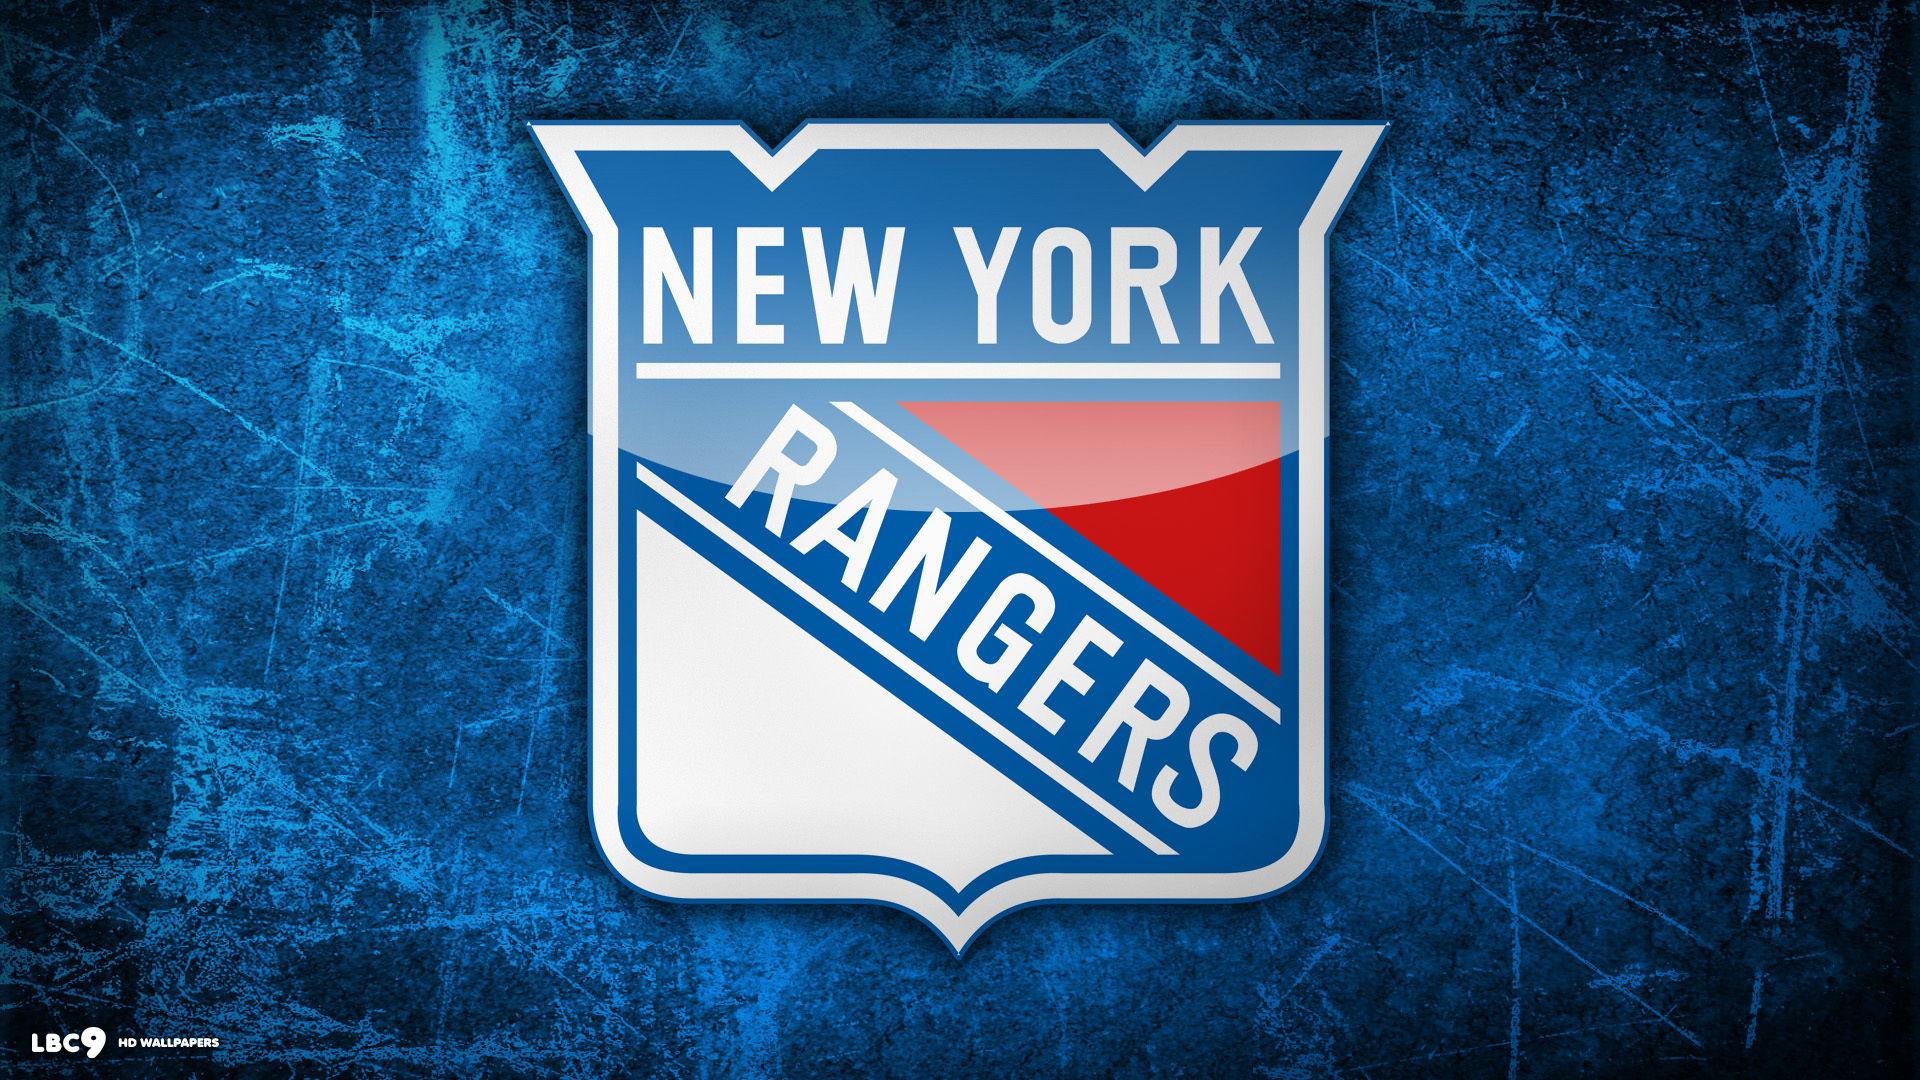 New York Rangers wallpapers New York Rangers background 1920x1080